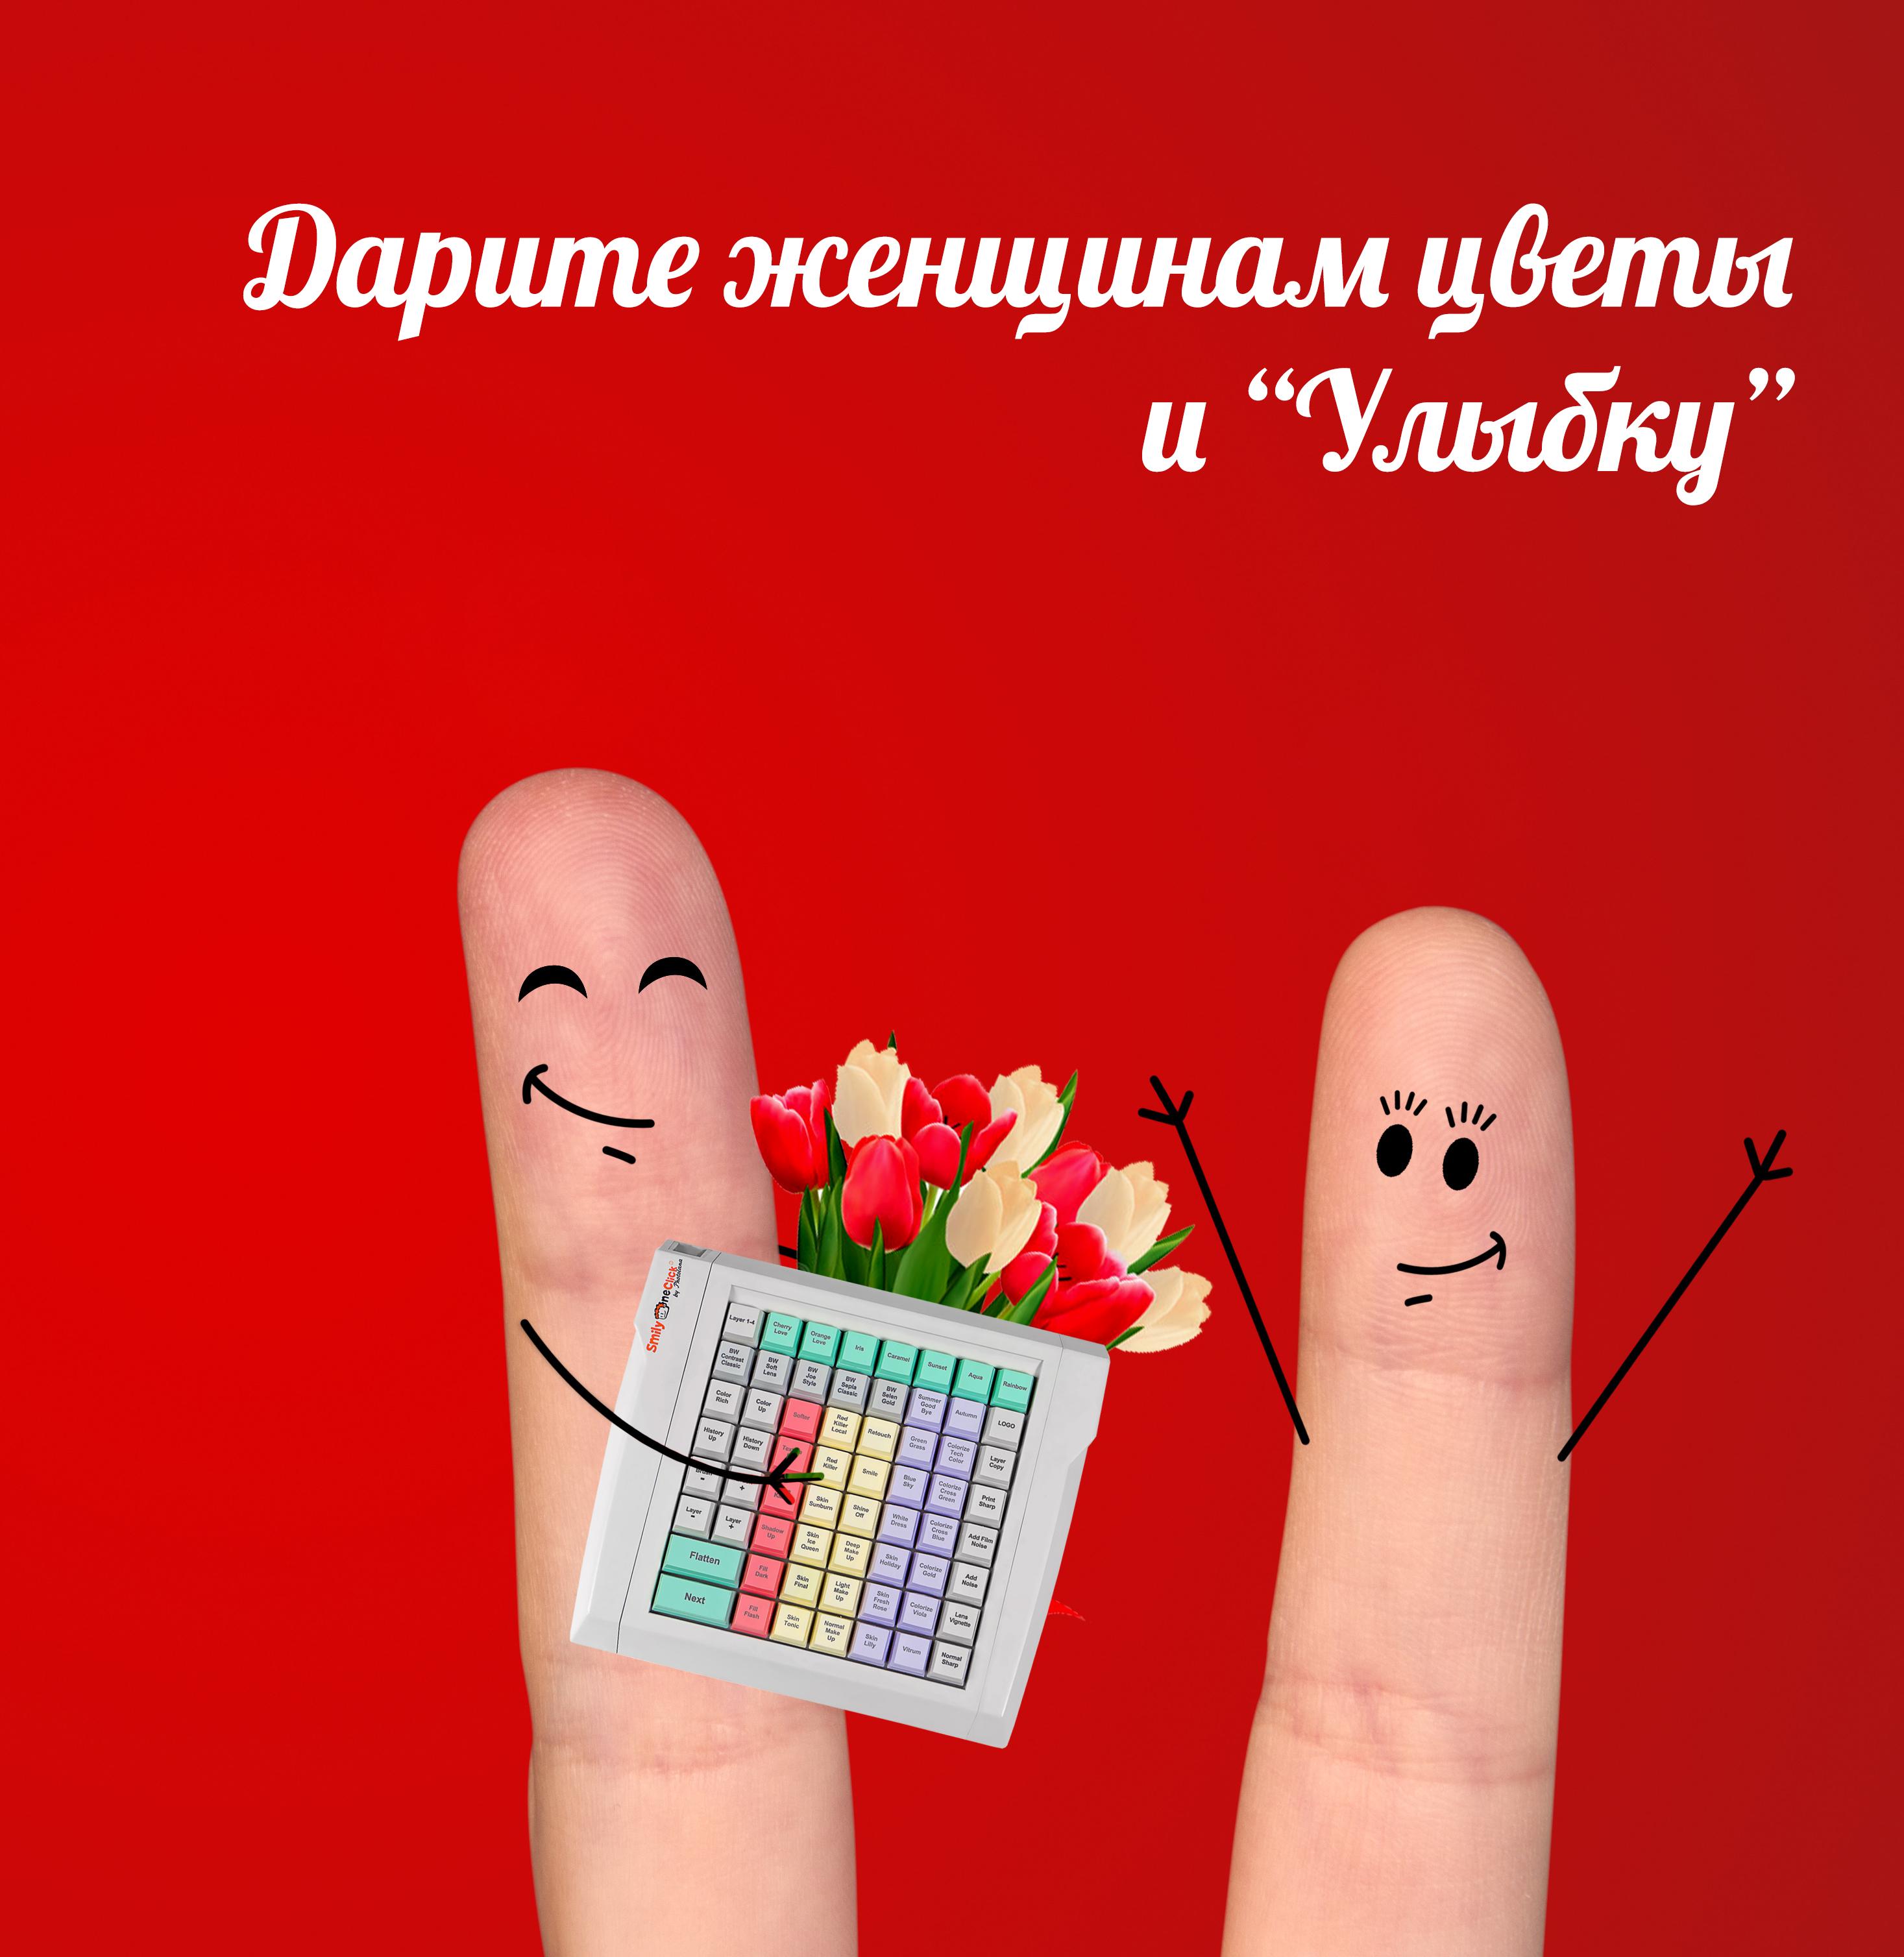 Дарите женщинам цветы и «Улыбку»